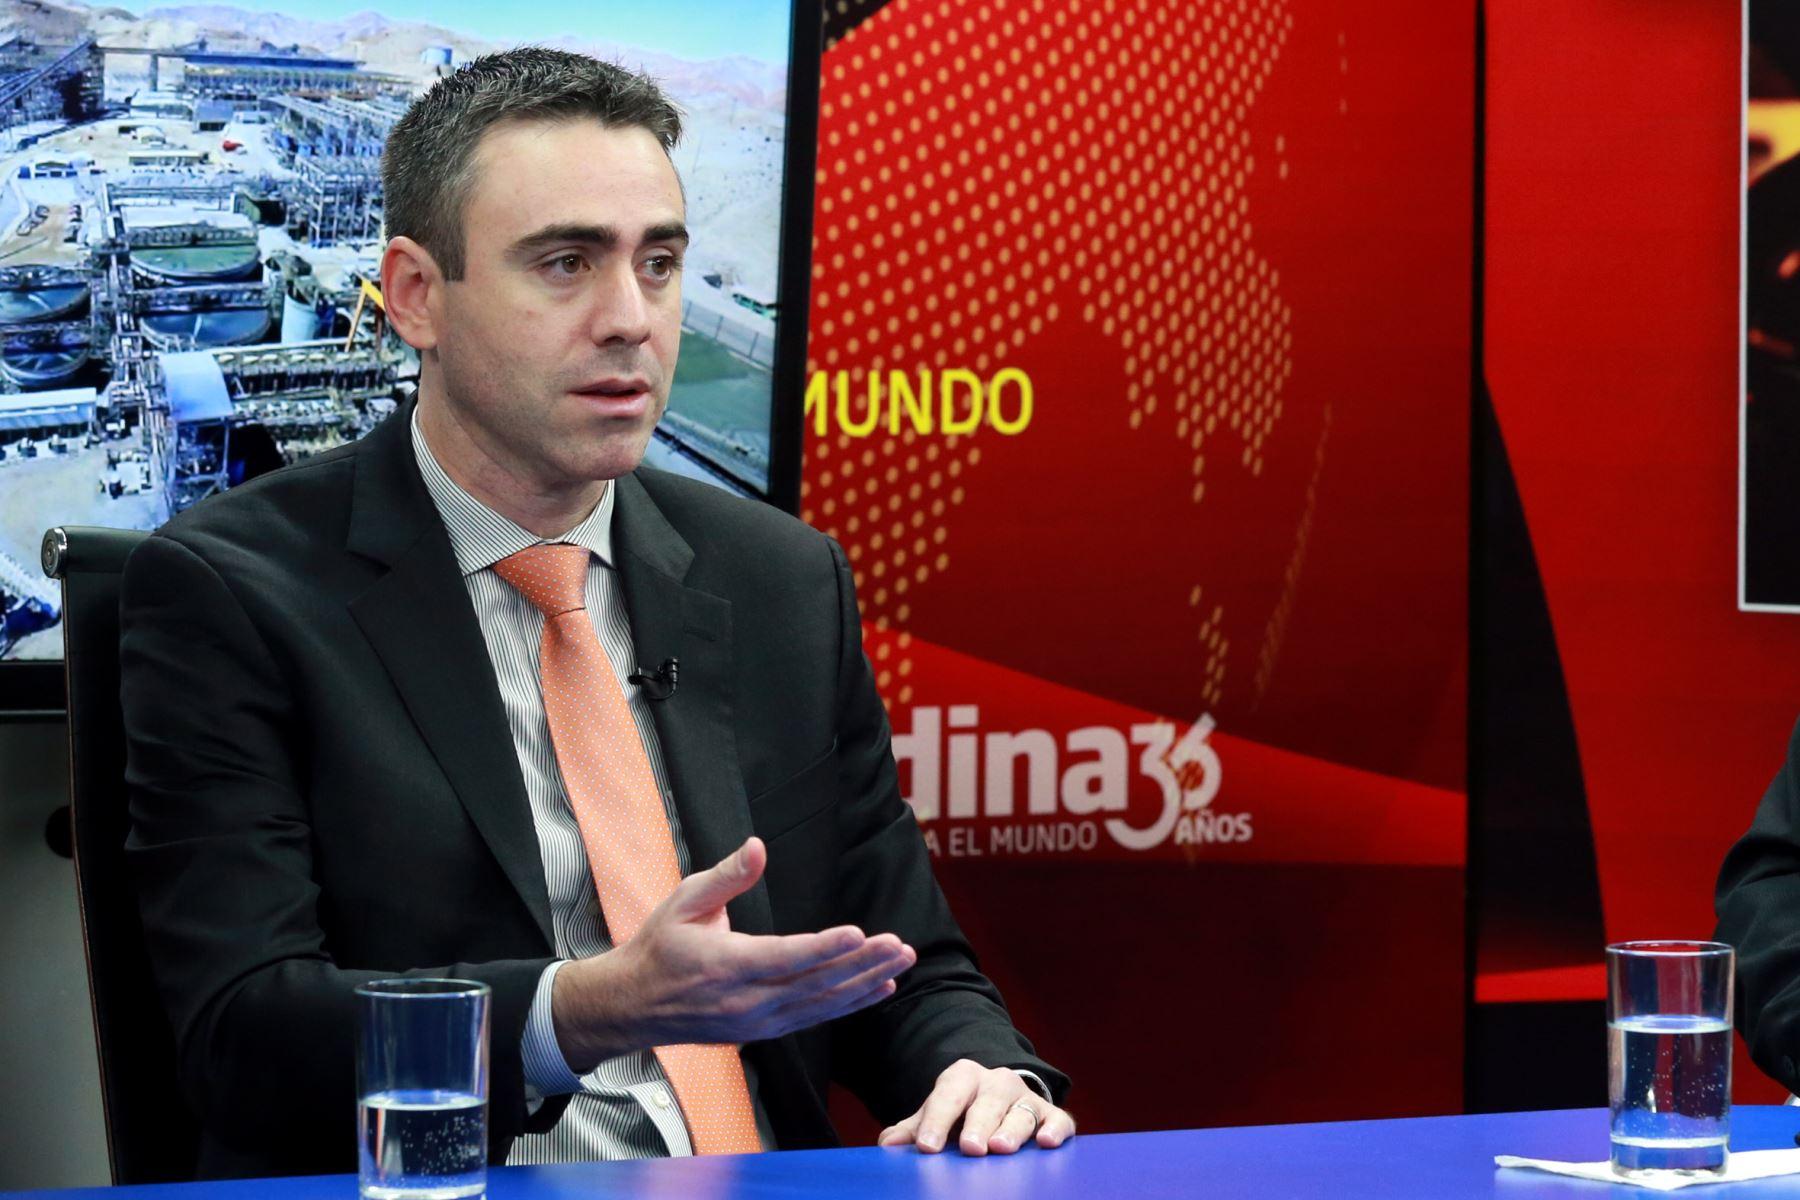 Vicepresidente del grupo Moody's Investors Service, Jaime Reusche. ANDINA/archivo